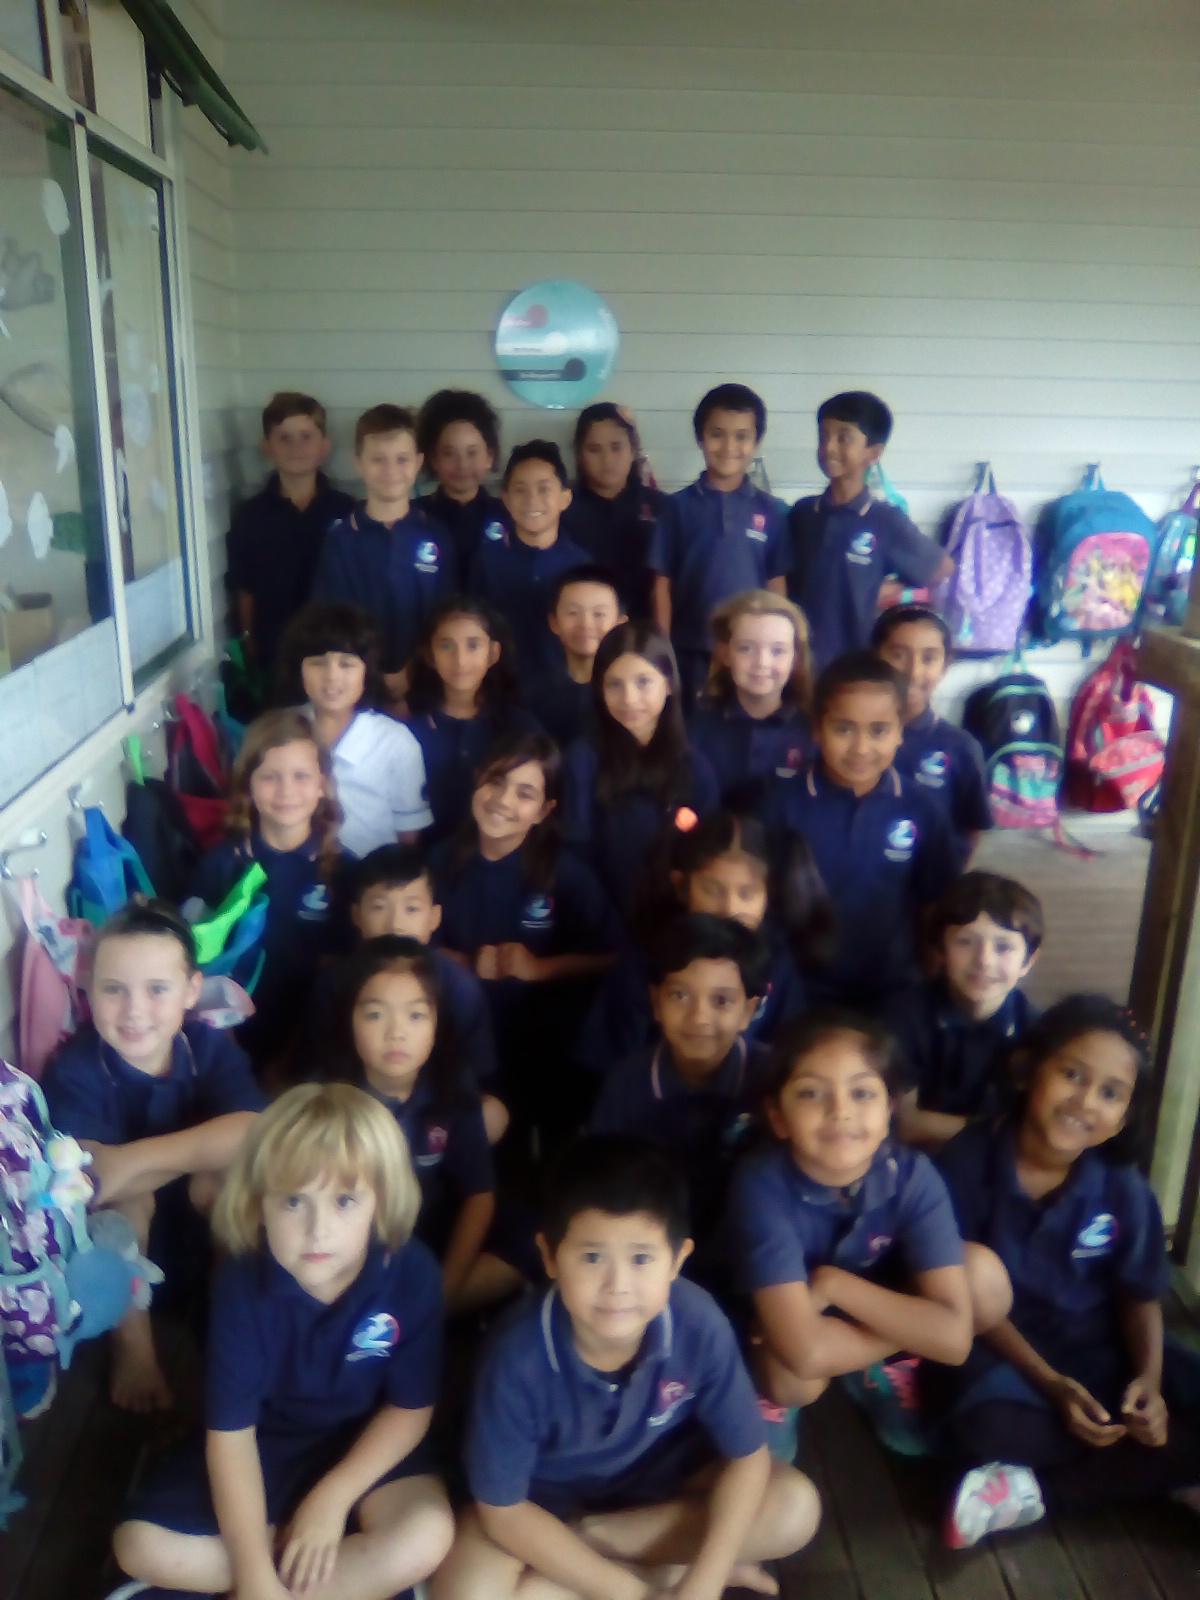 Blockhouse Bay Primary School - He Manu Rere